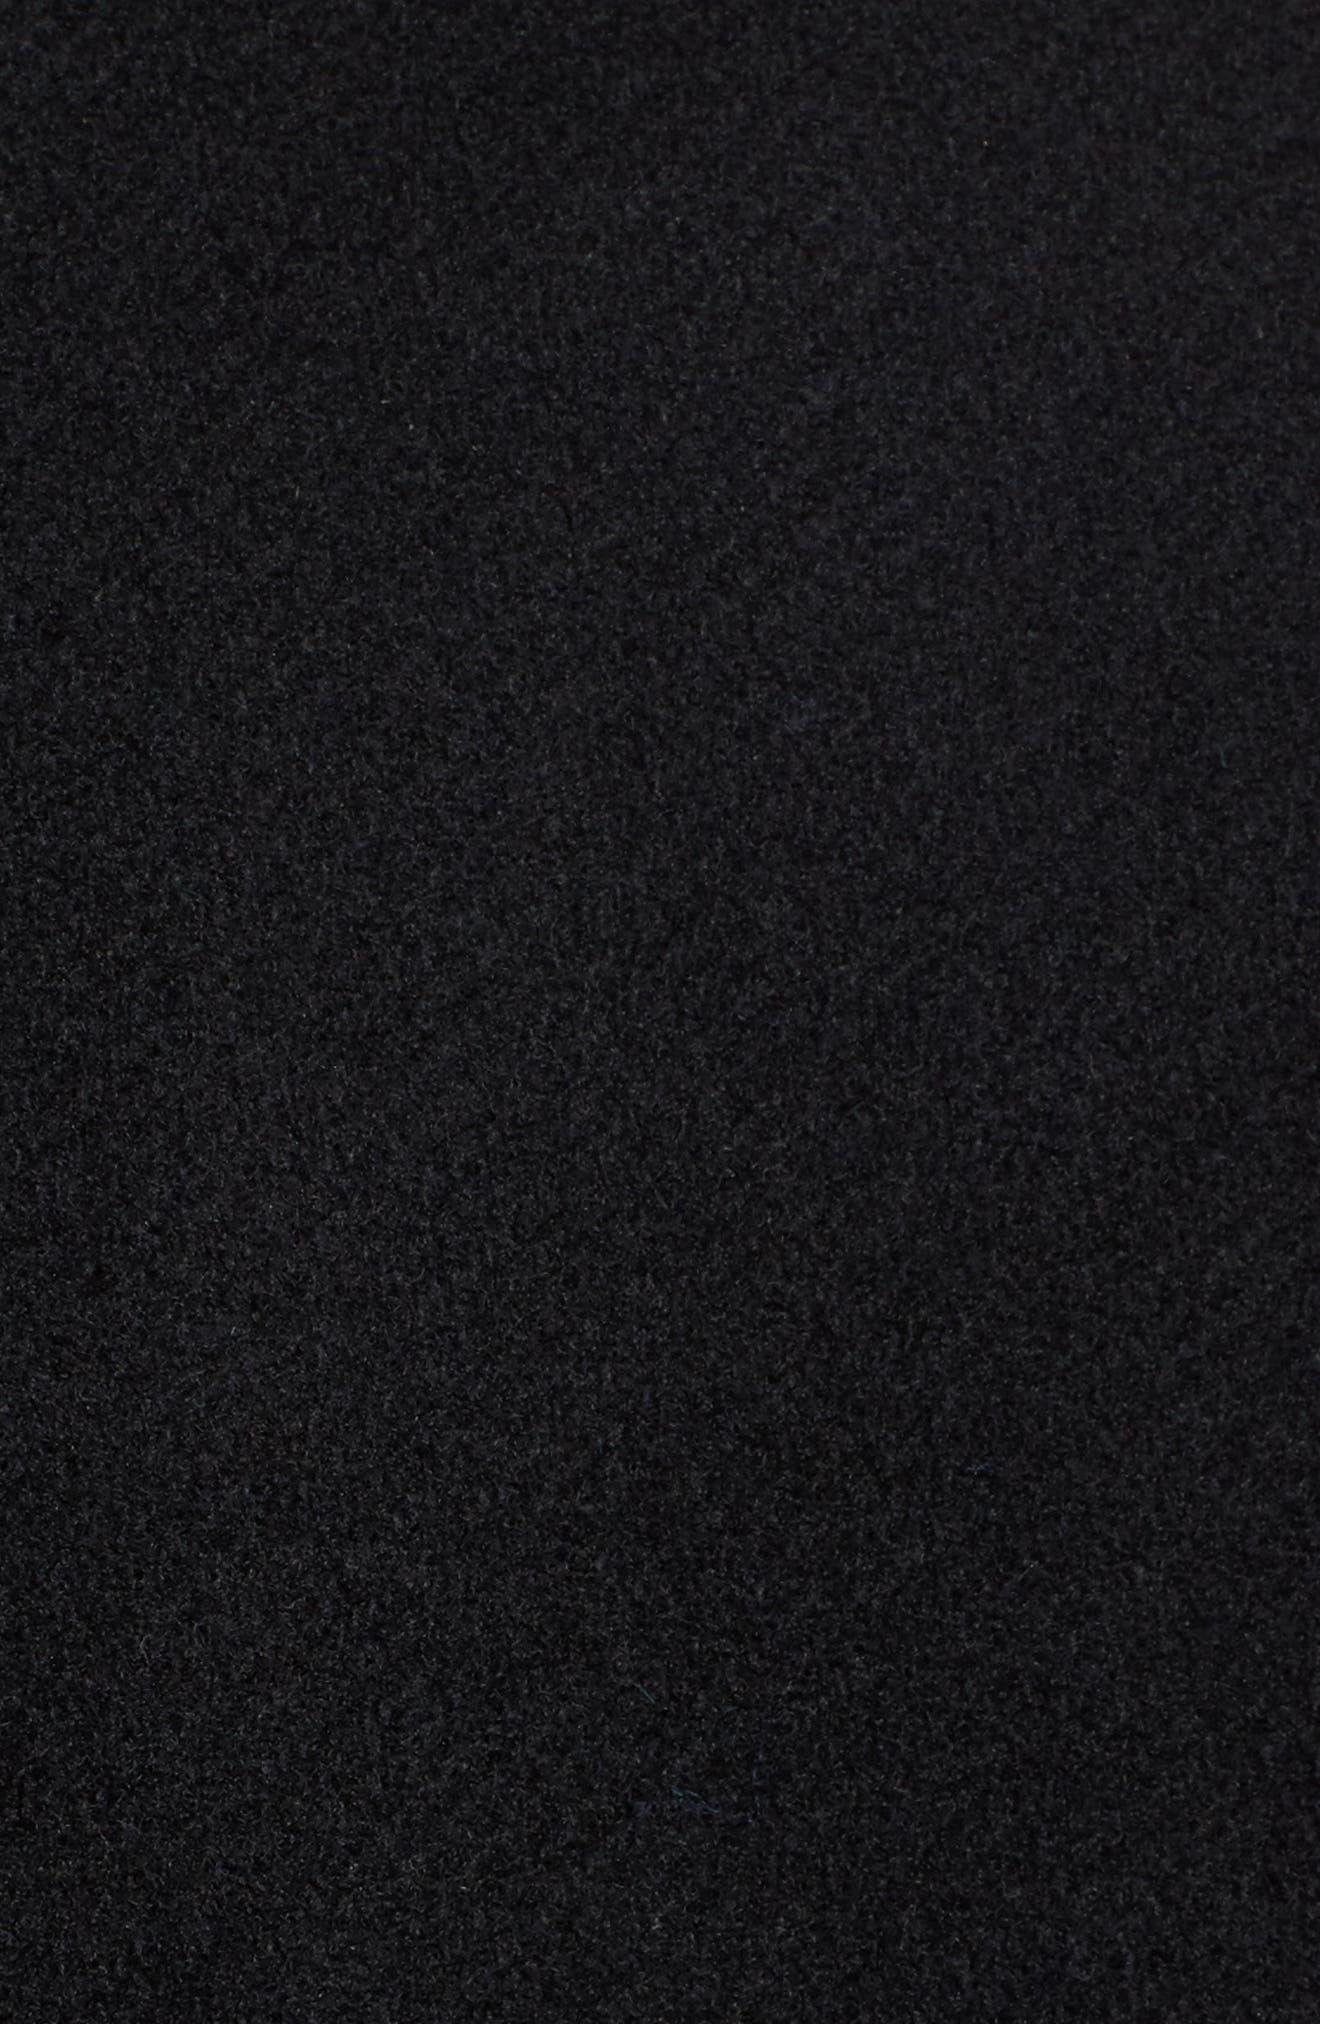 Eleanor Leather Trim Wool Blend Coat,                             Alternate thumbnail 6, color,                             002